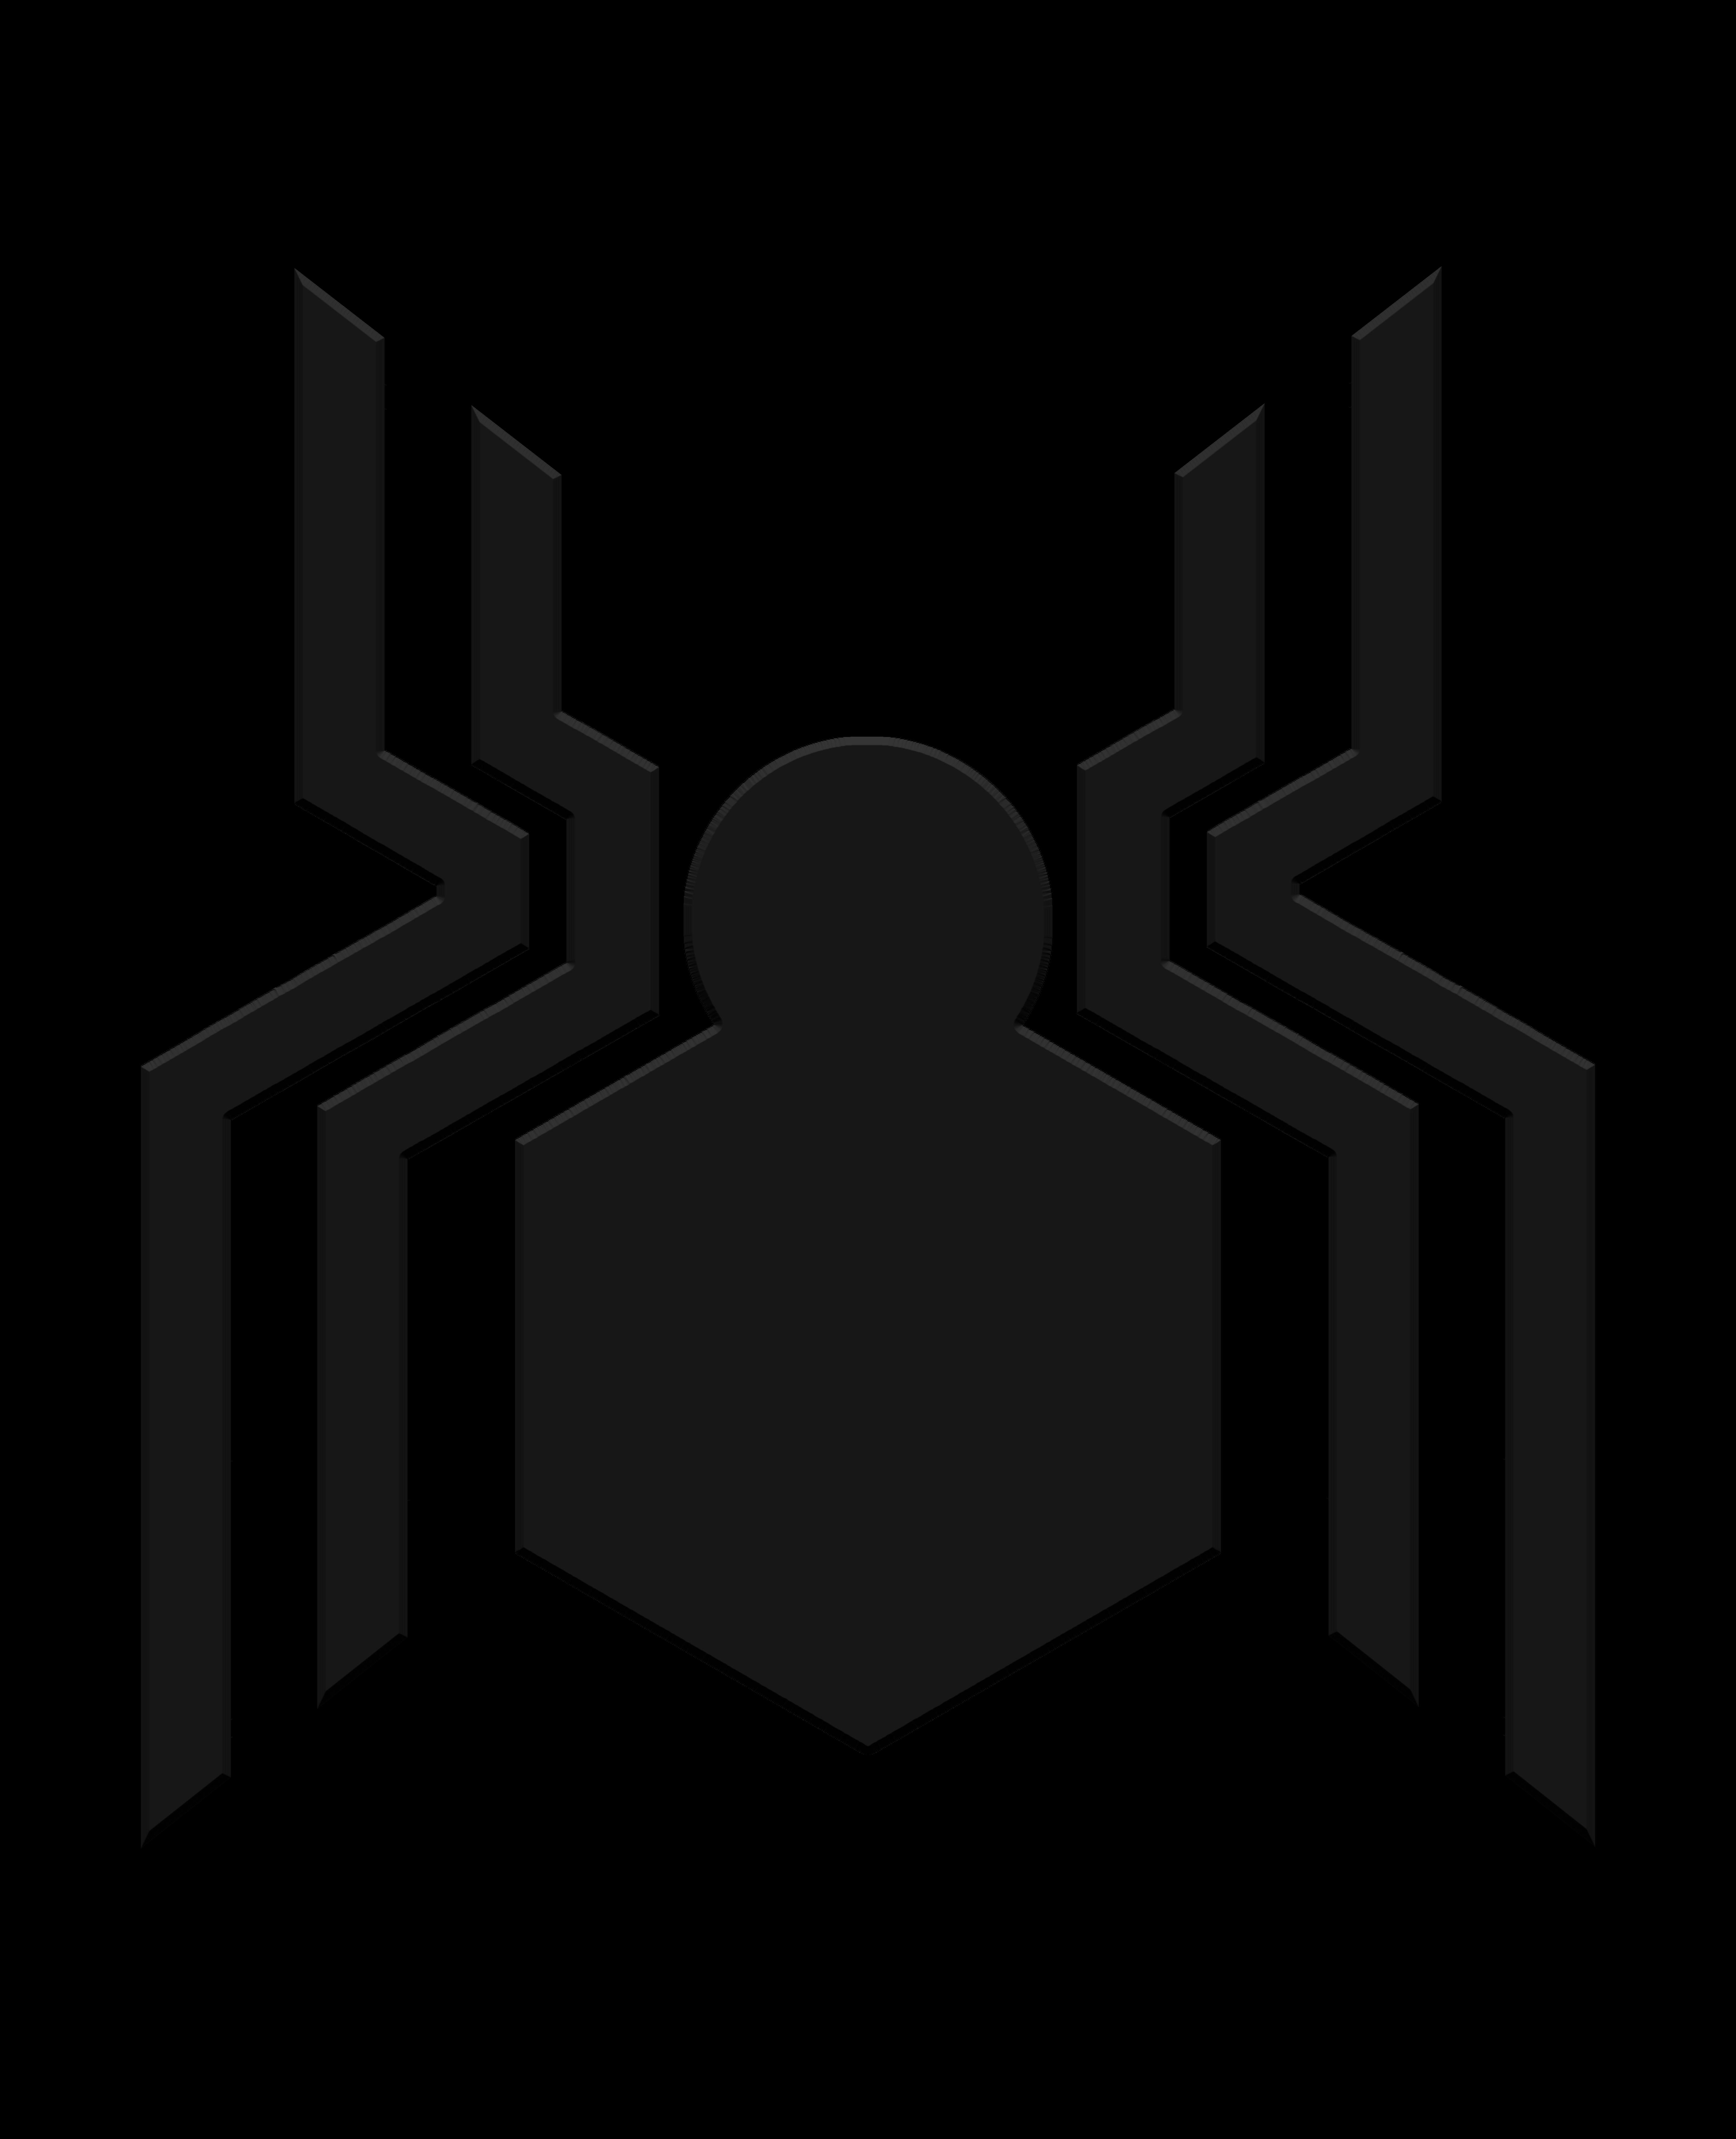 Balsavor 57 4 Spider-Man logo - Captain Armerica: Civil War by  ultimate-savage - Spiderman Logo PNG